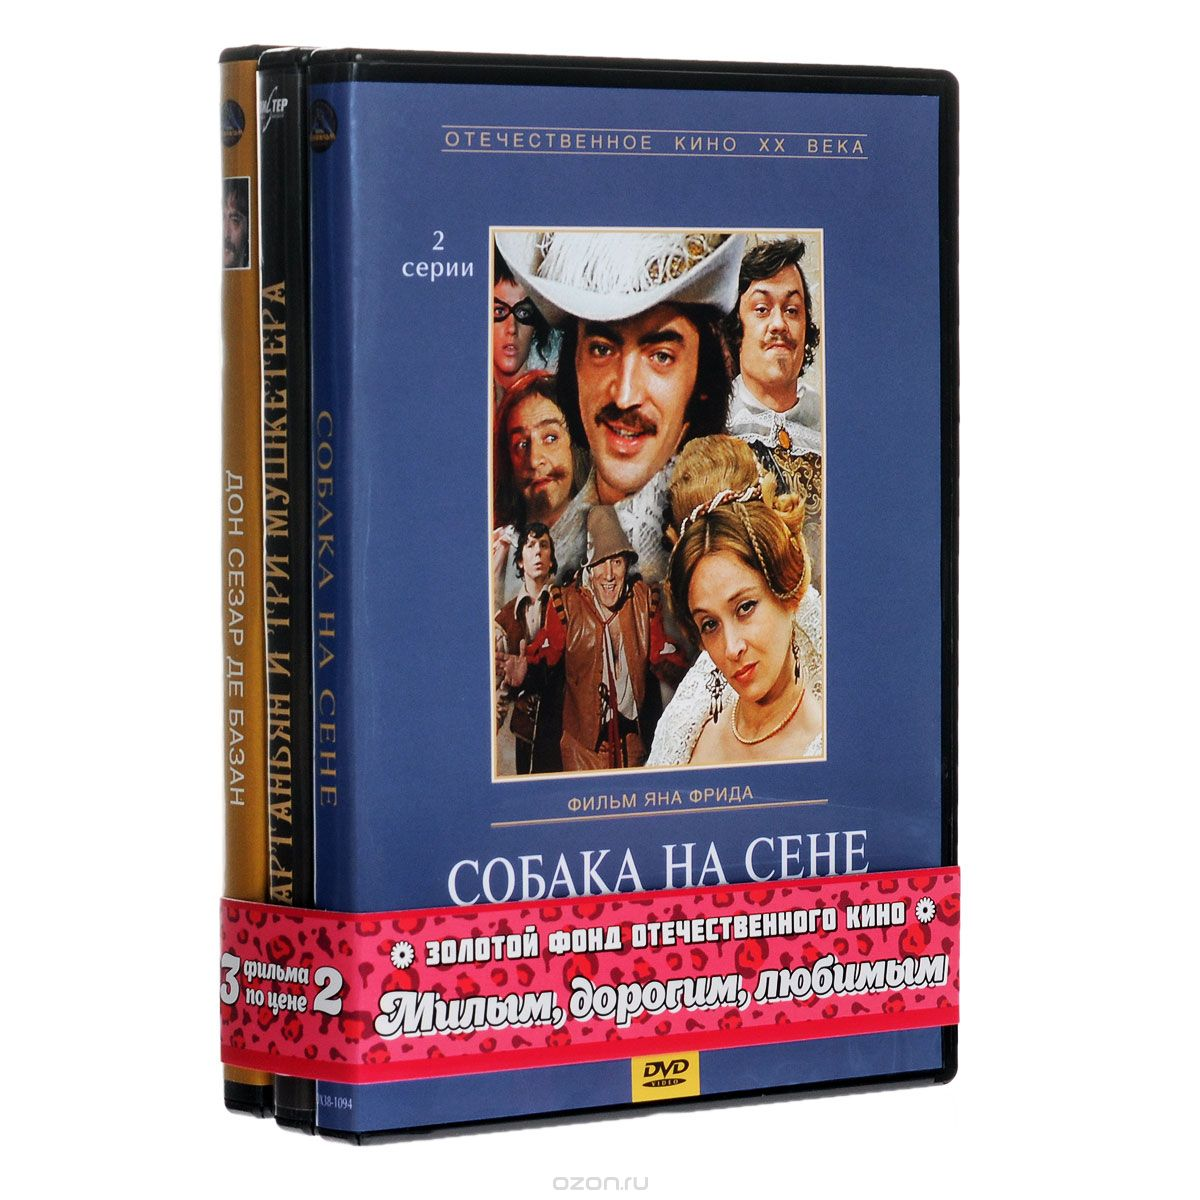 Милым, дорогим, любимым: Д'Артаньян и три мушкетера. 1-3 серии / Дон Сезар де Базан. 1-2 серии / Собака на сене. 1-2 серии (3 DVD) милым дорогим любимым ключ от спальни 1 2 серии красавец мужчина 1 2 серии ханума 1 2 серии 3 dvd